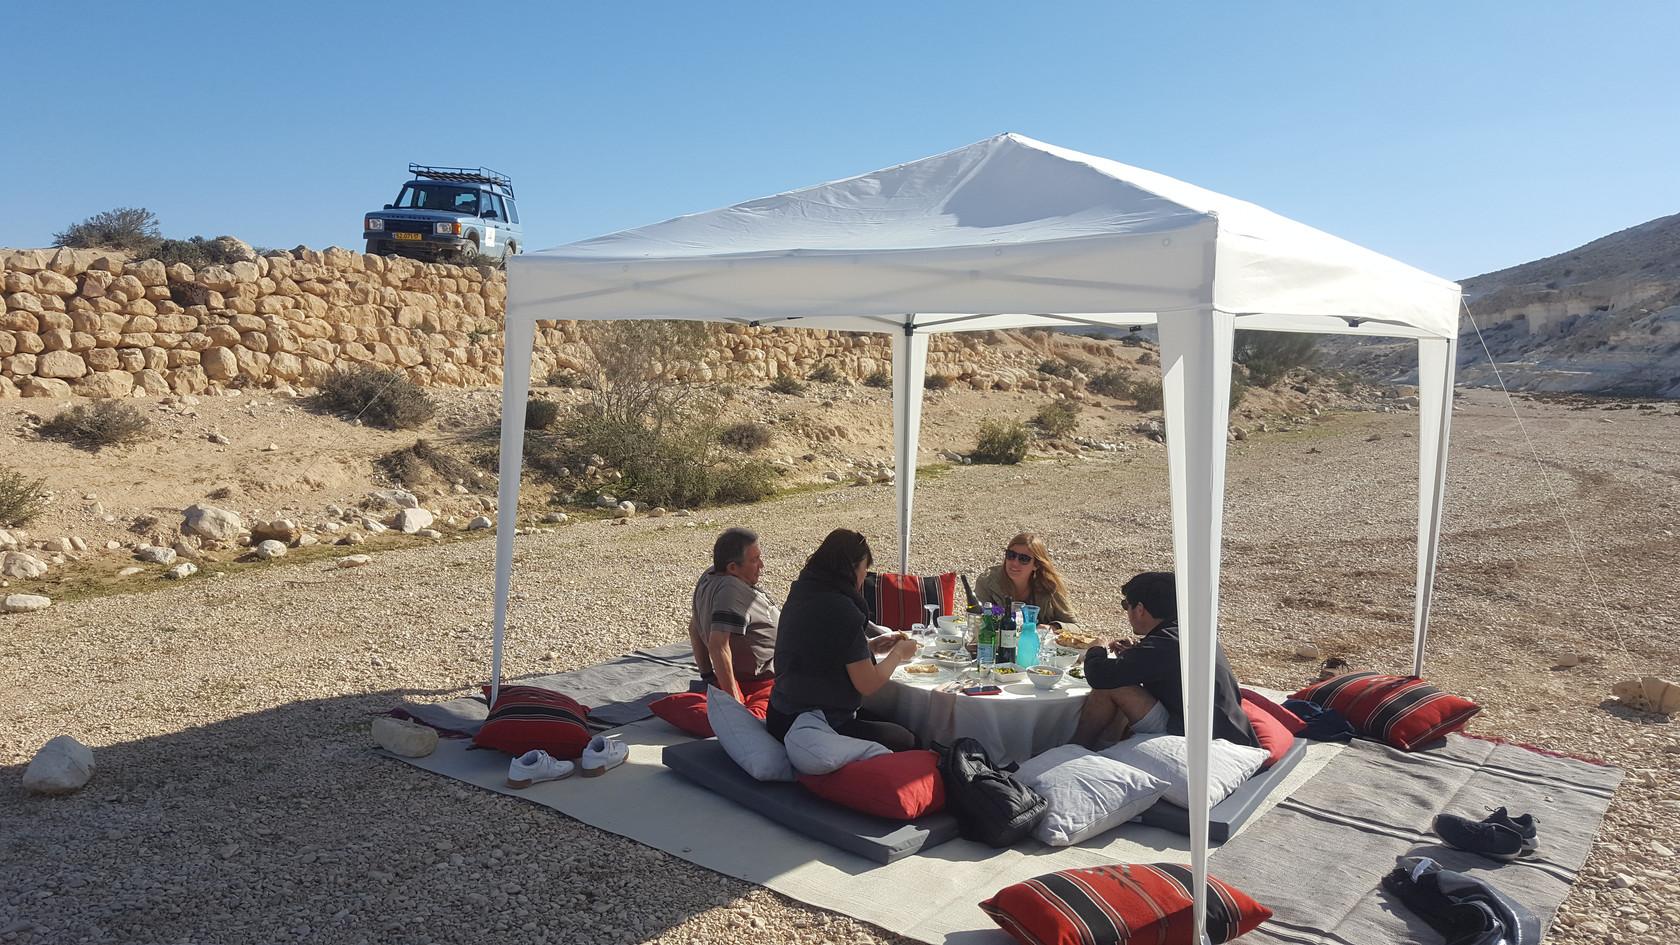 Family outdoor meal in the Negev Desert